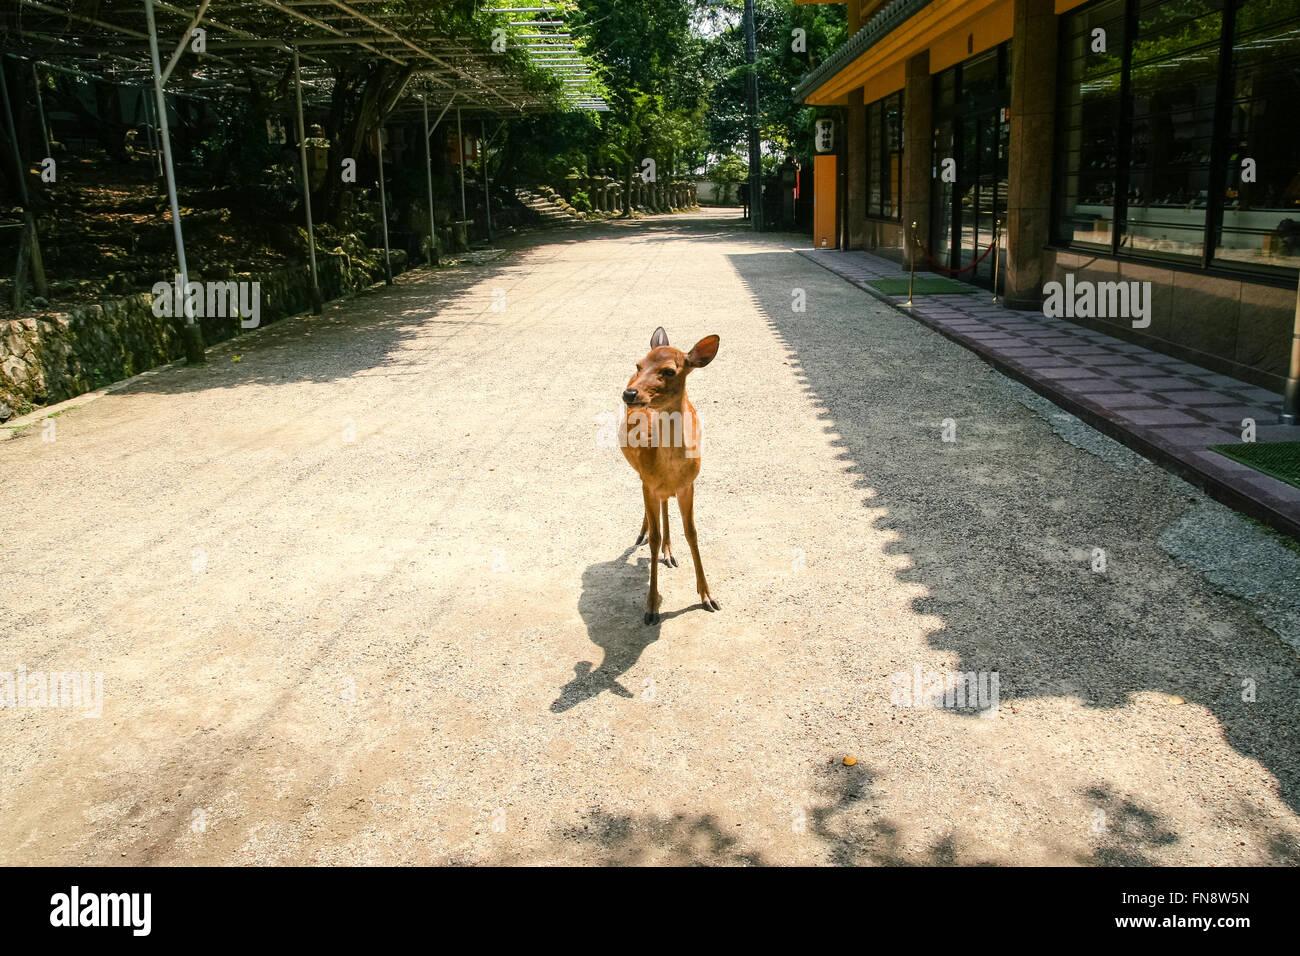 deer in the street - Stock Image